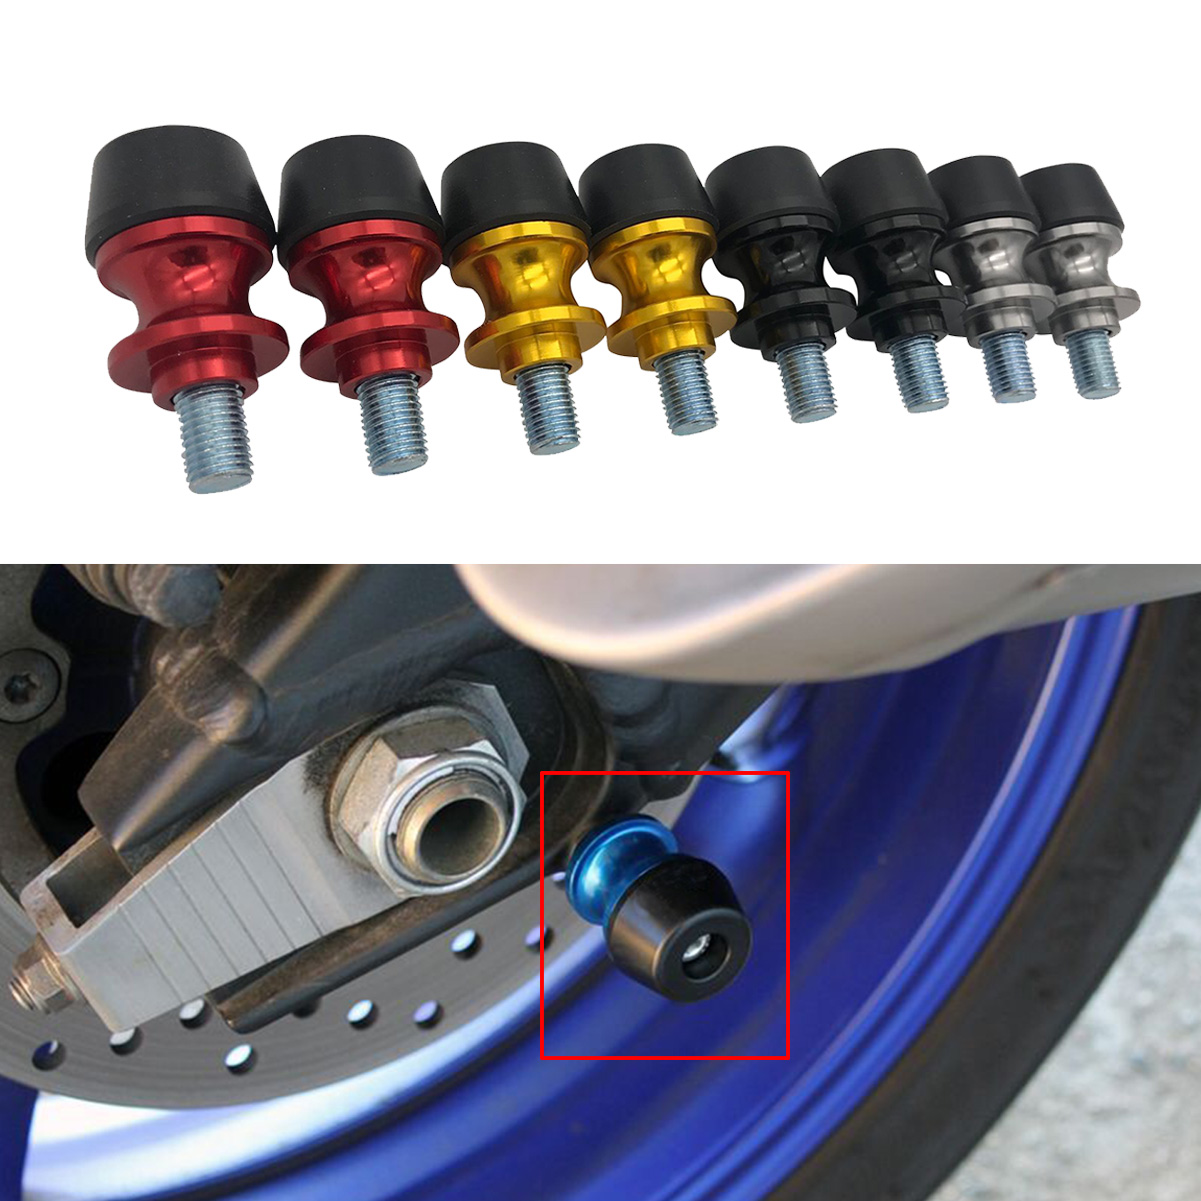 CNC Motorcycle Swingarm Spools Sliders For Kawasaki Ninja ZX6R ZX10R ZX12R ZX14R